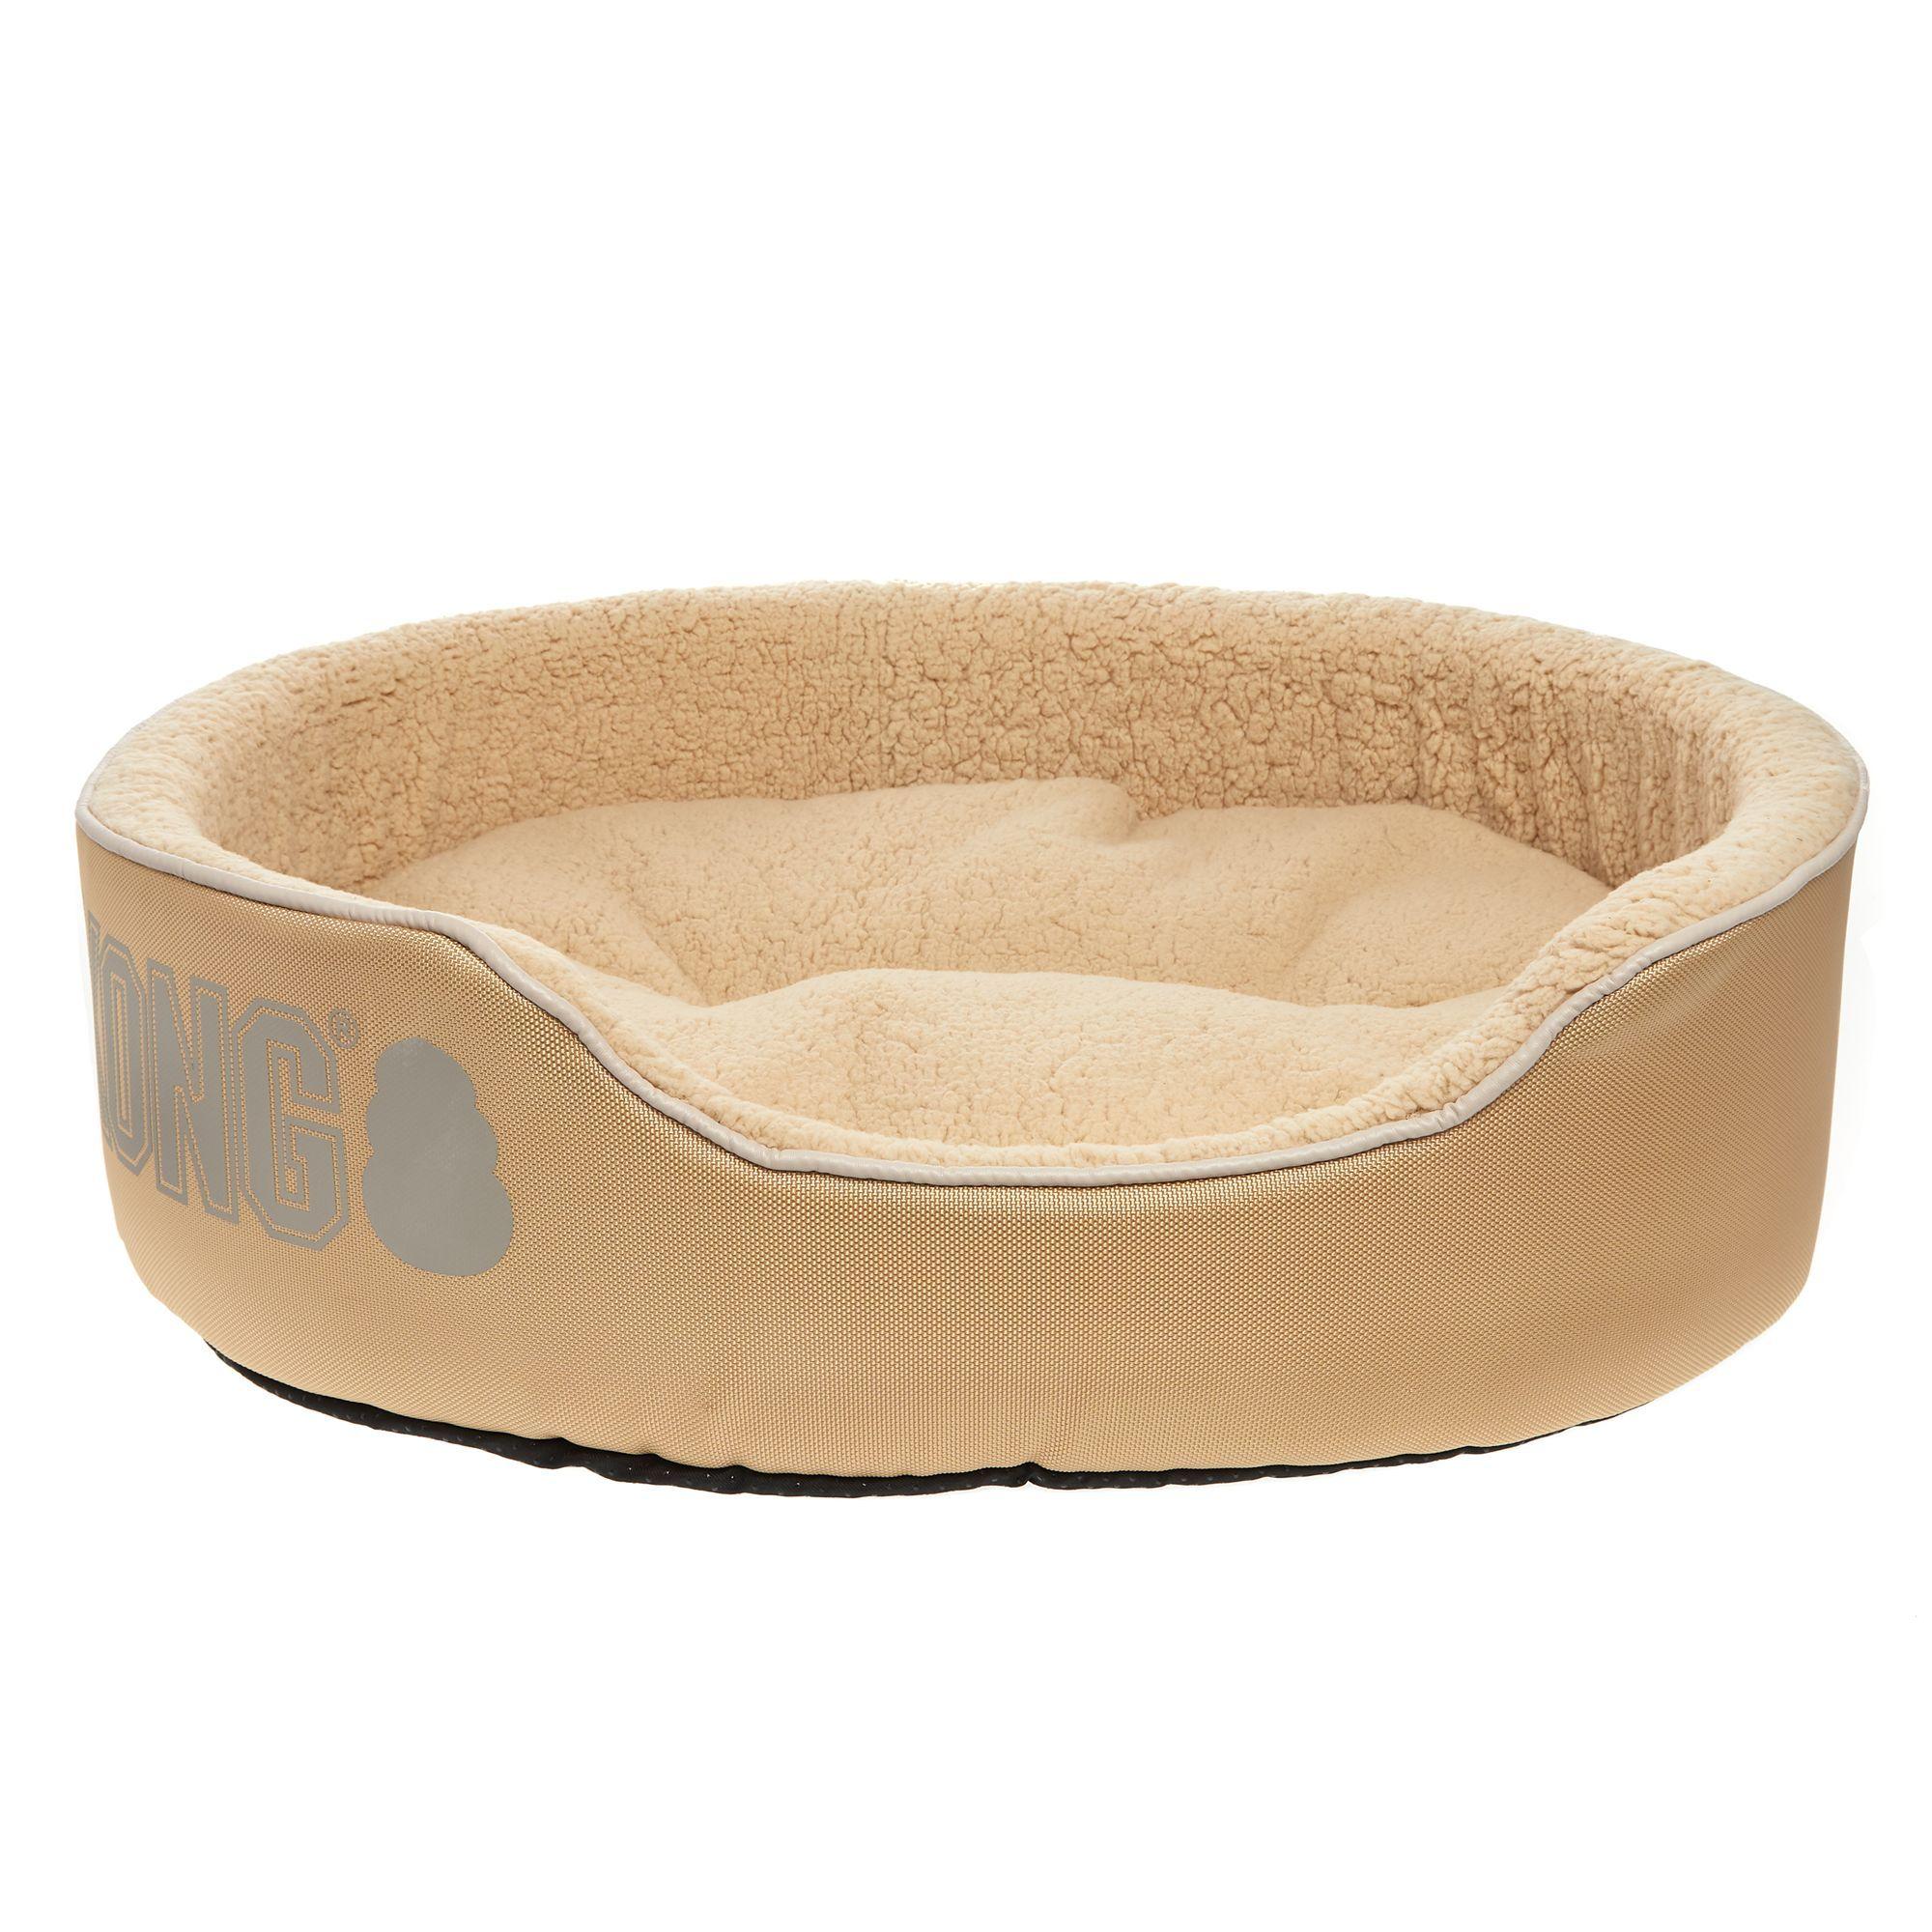 Kong Cuddler Pet Bed, Pets